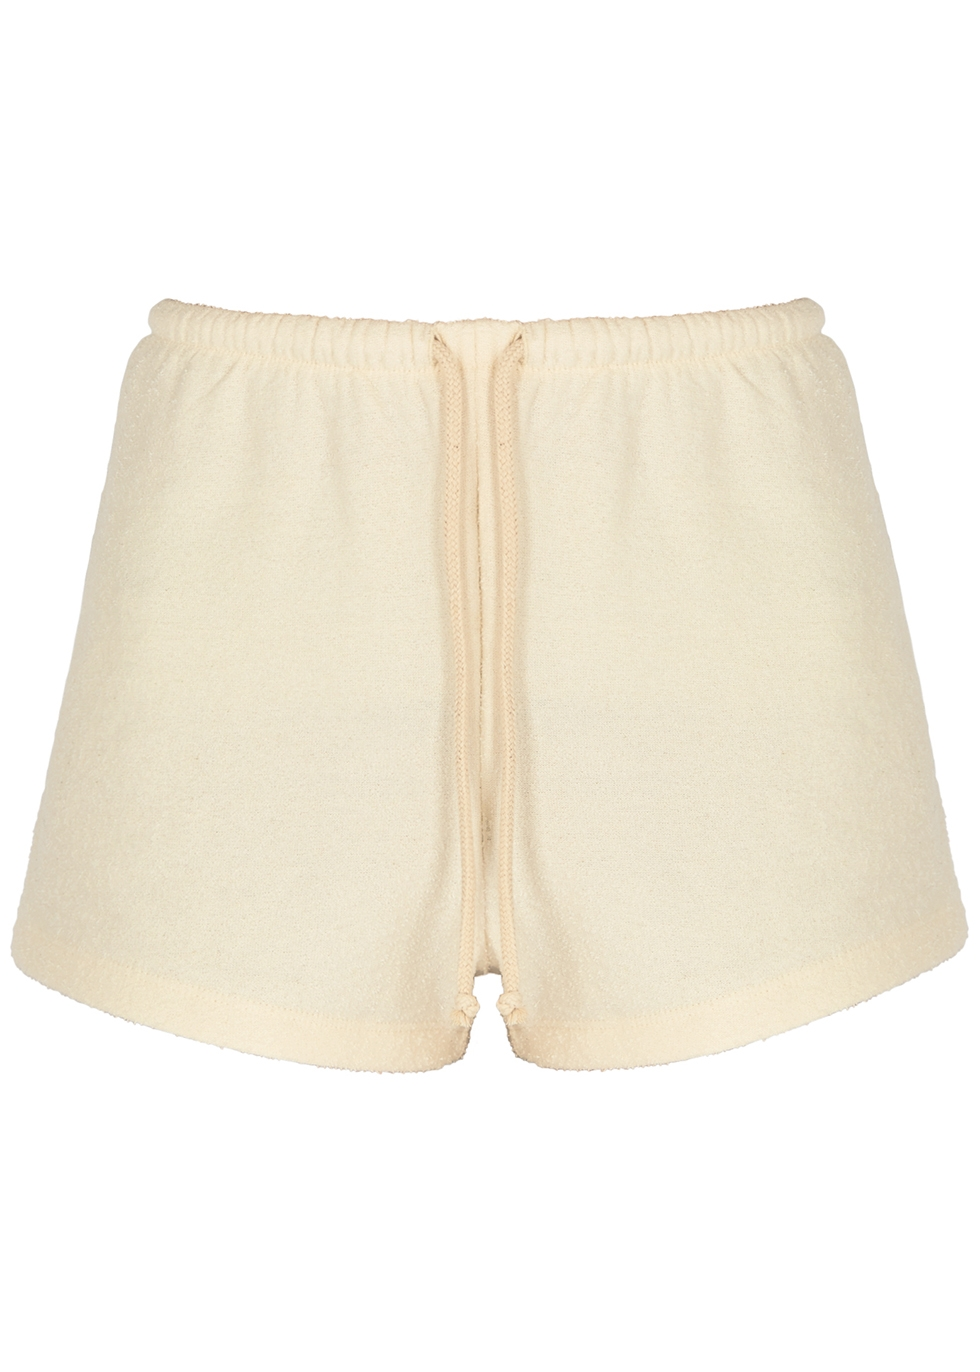 Bobypark off-white terry cotton shorts